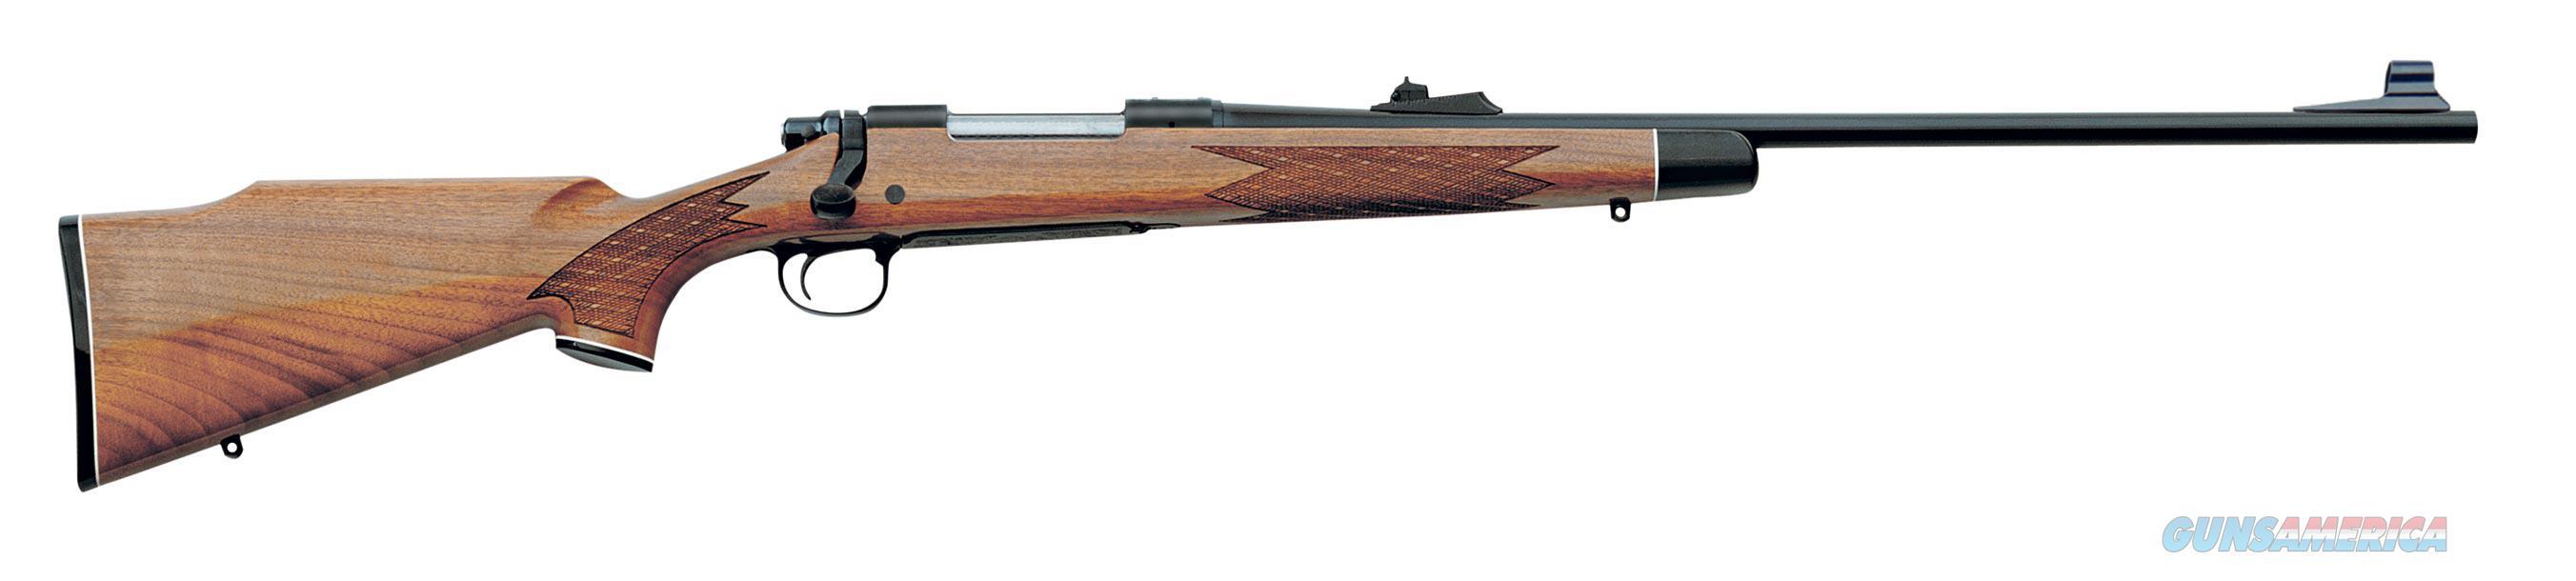 "Remington Model 700 BDL .243 Win 22"" Walnut 4 Rds 25787   Guns > Rifles > Remington Rifles - Modern > Model 700 > Sporting"